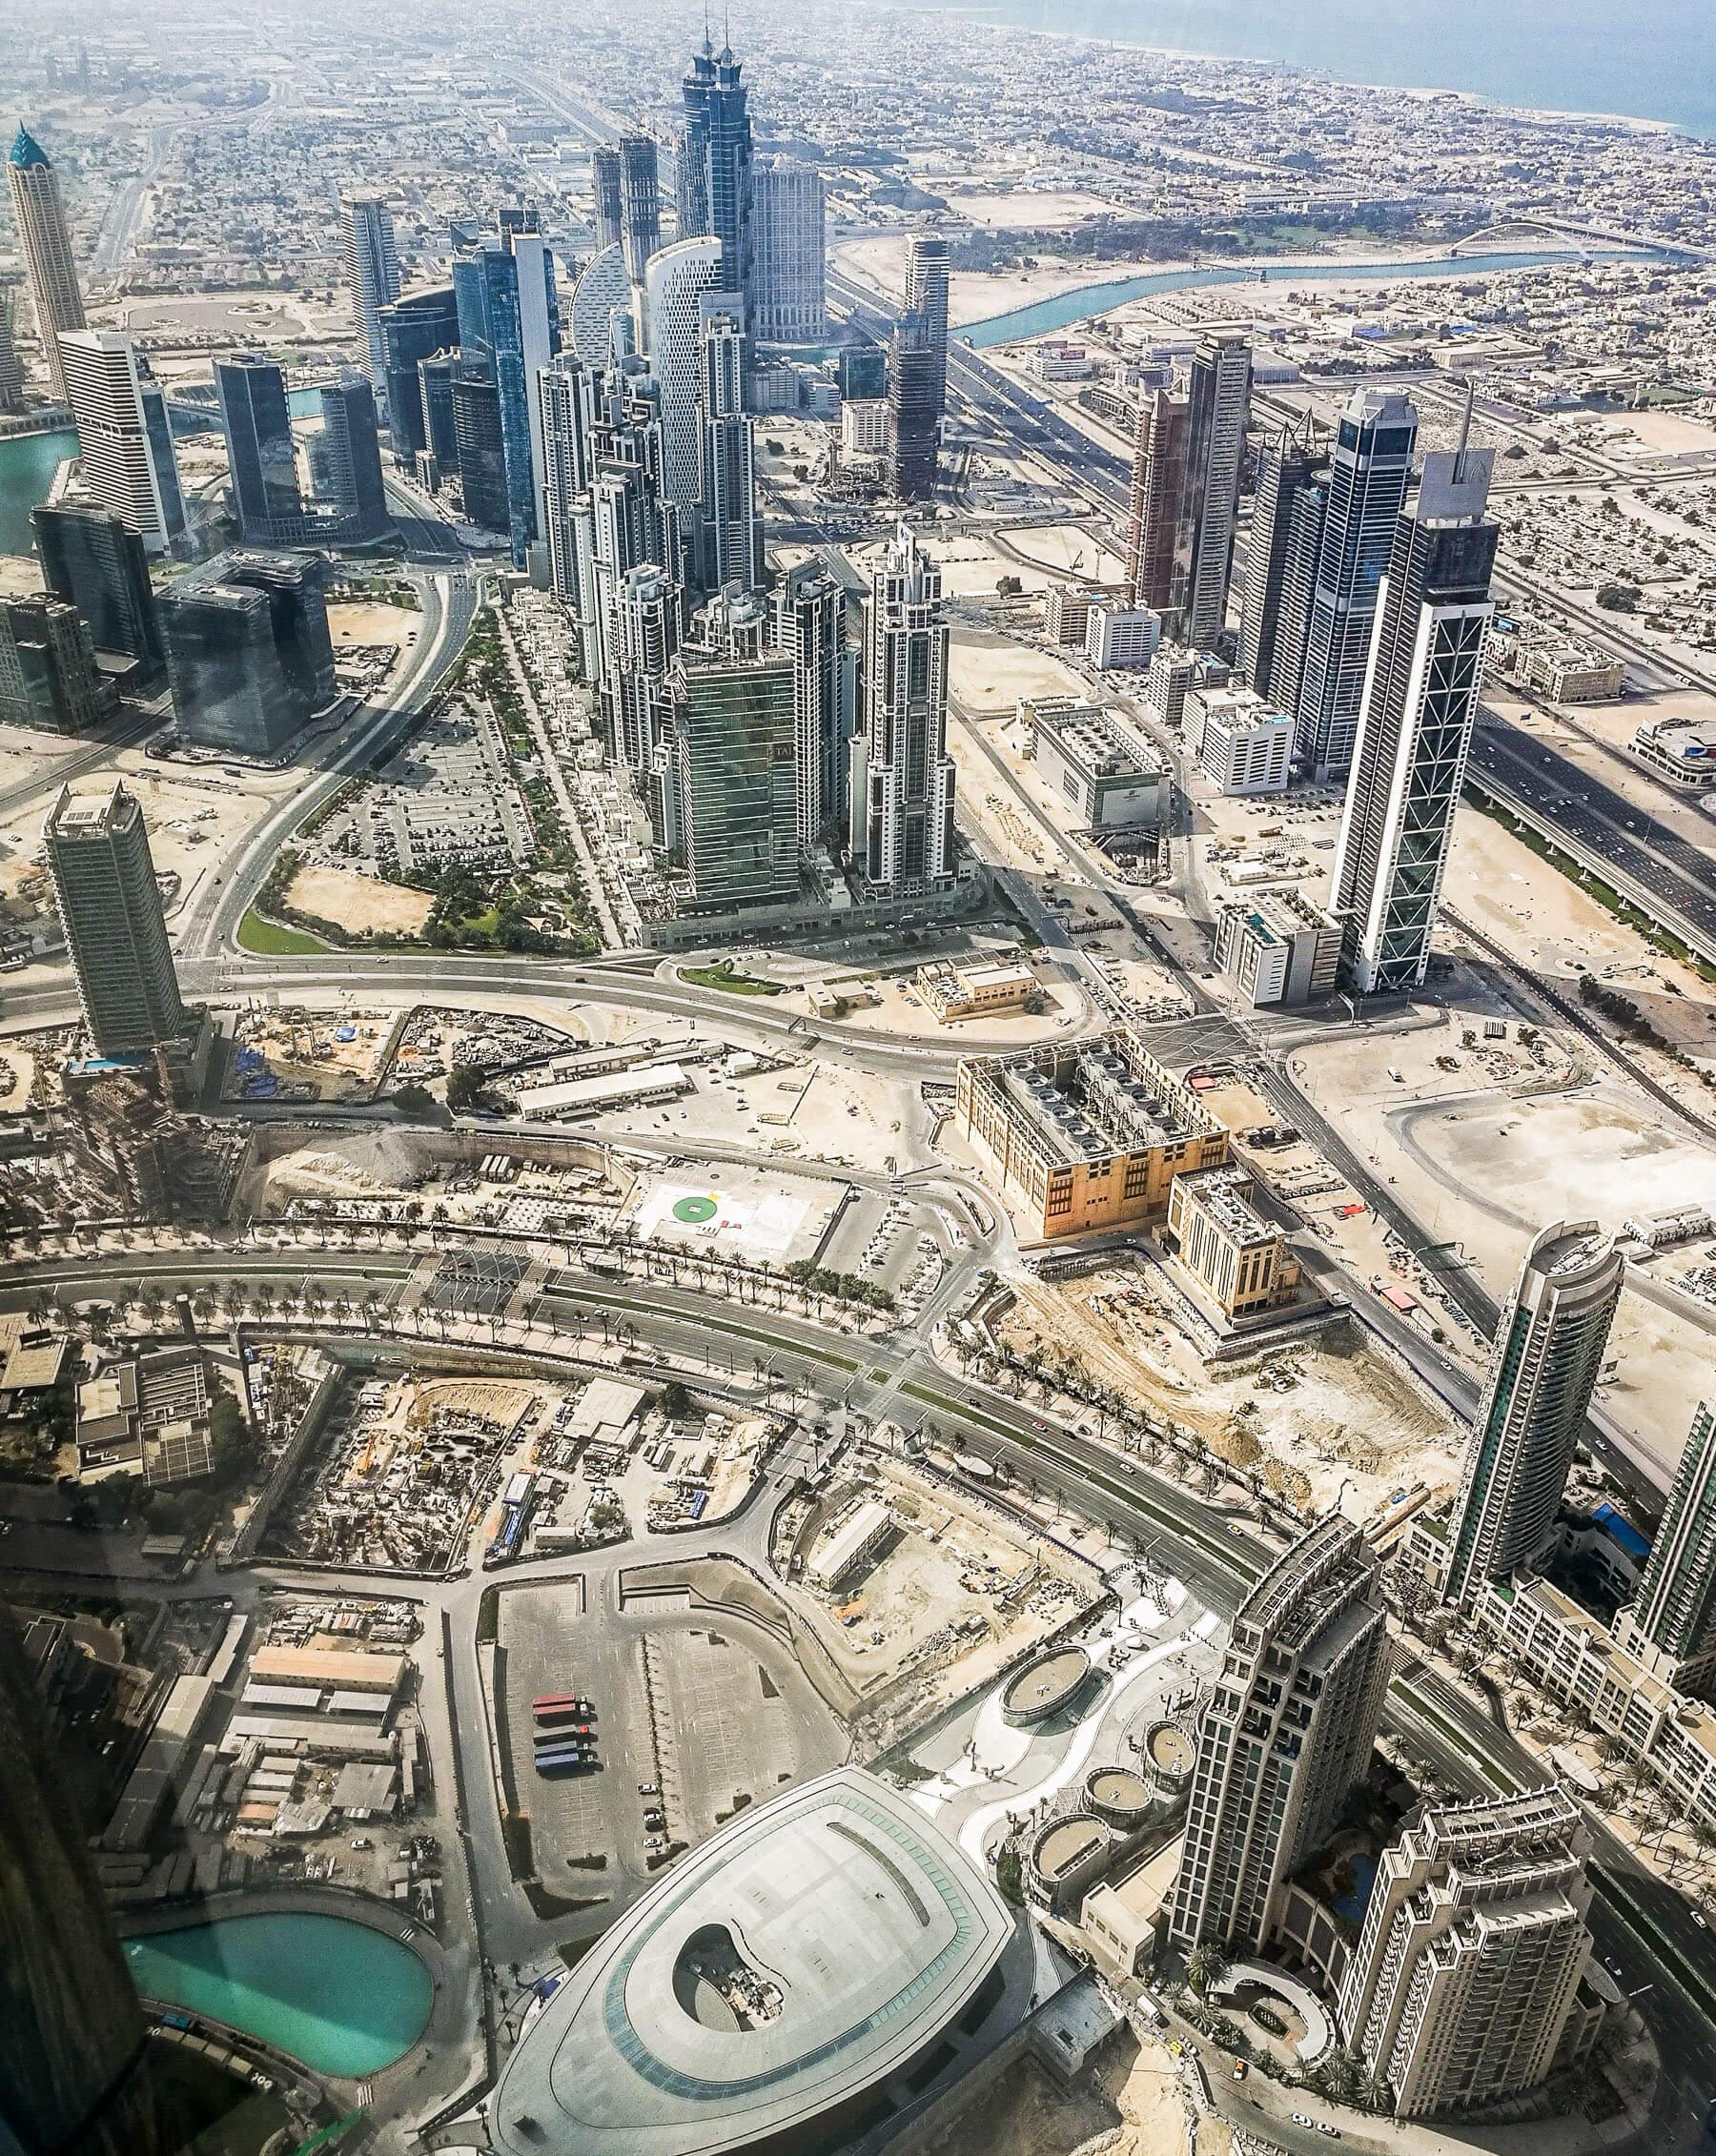 View from Burj Khalifa overlooking Dubai